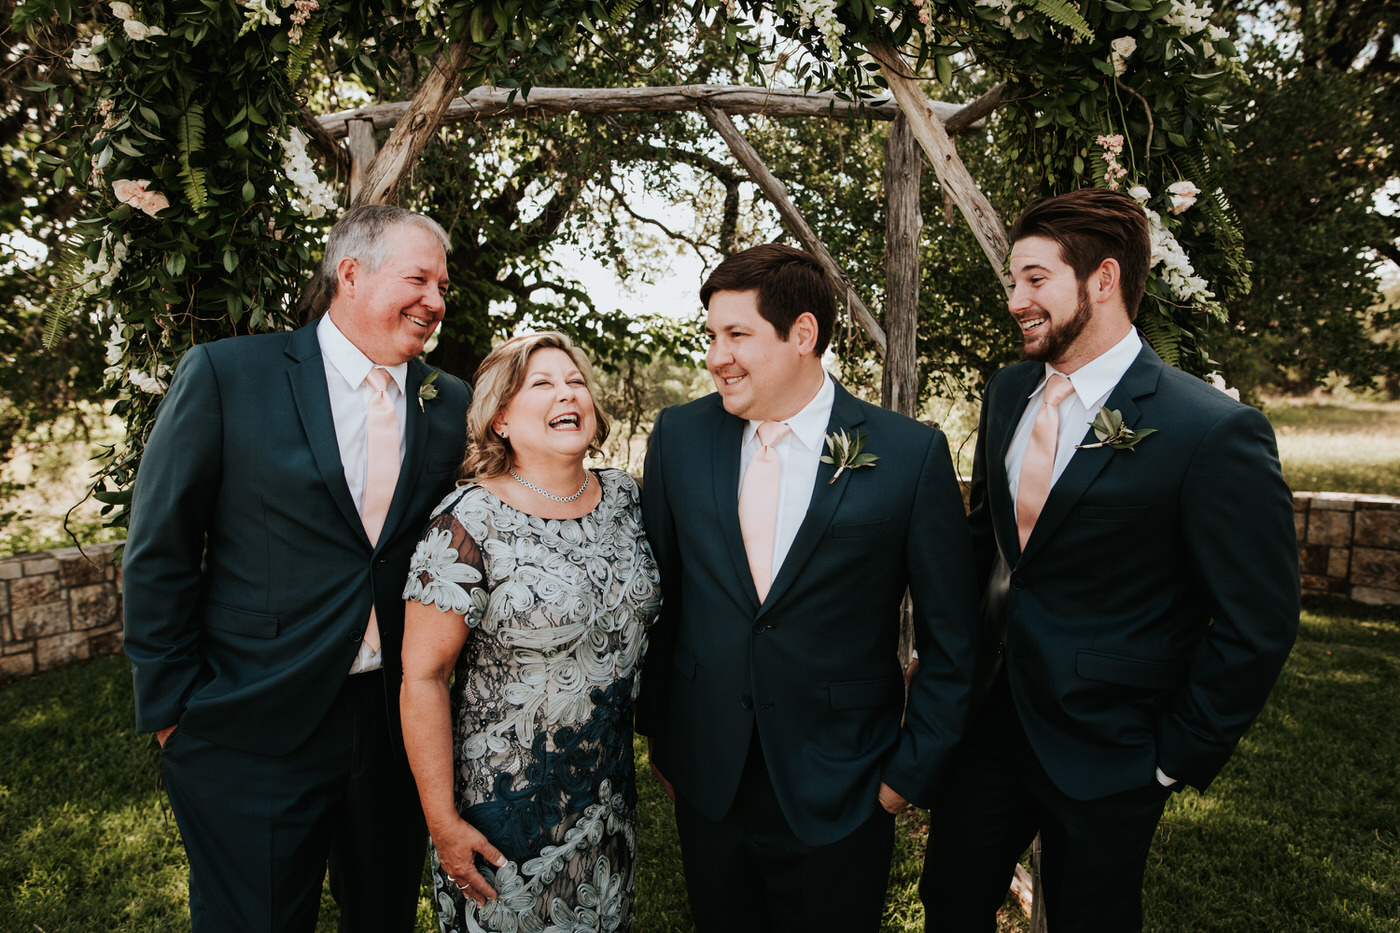 Thurman Mansion Wedding - Diana Ascarrrunz Photography -556.jpg